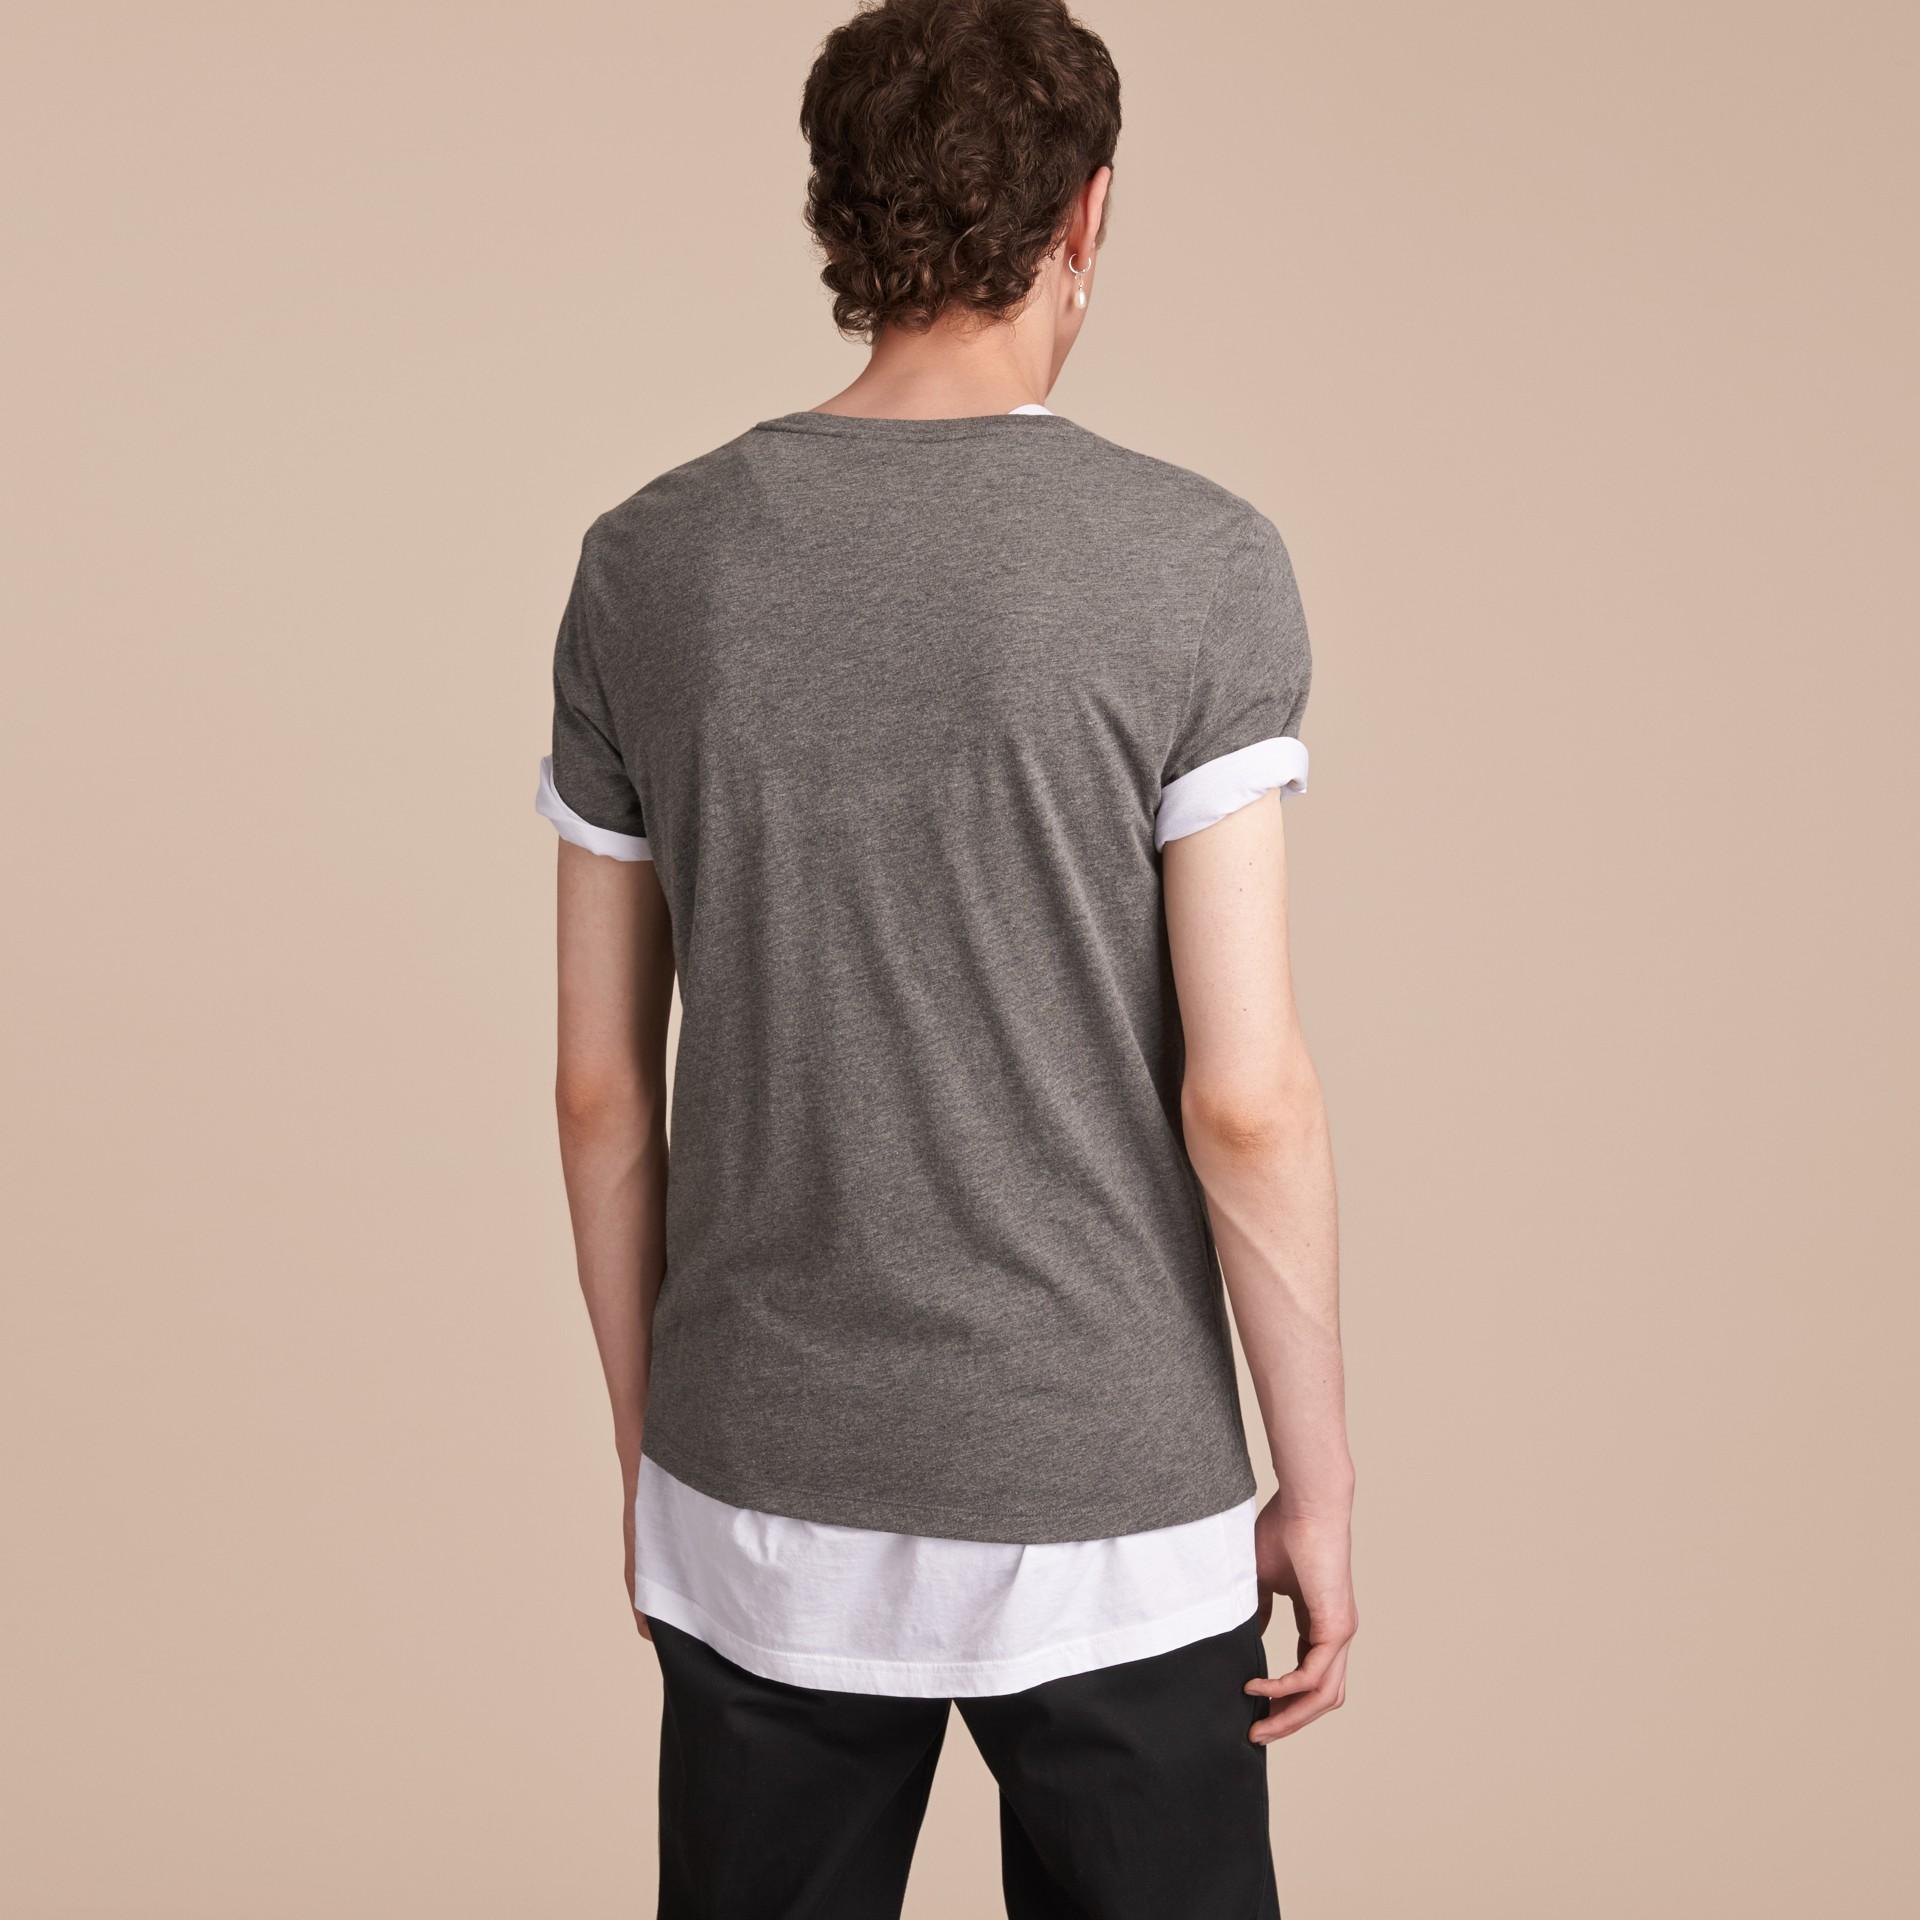 Devoré Cotton Jersey T-shirt in Mid Grey Melange - gallery image 3